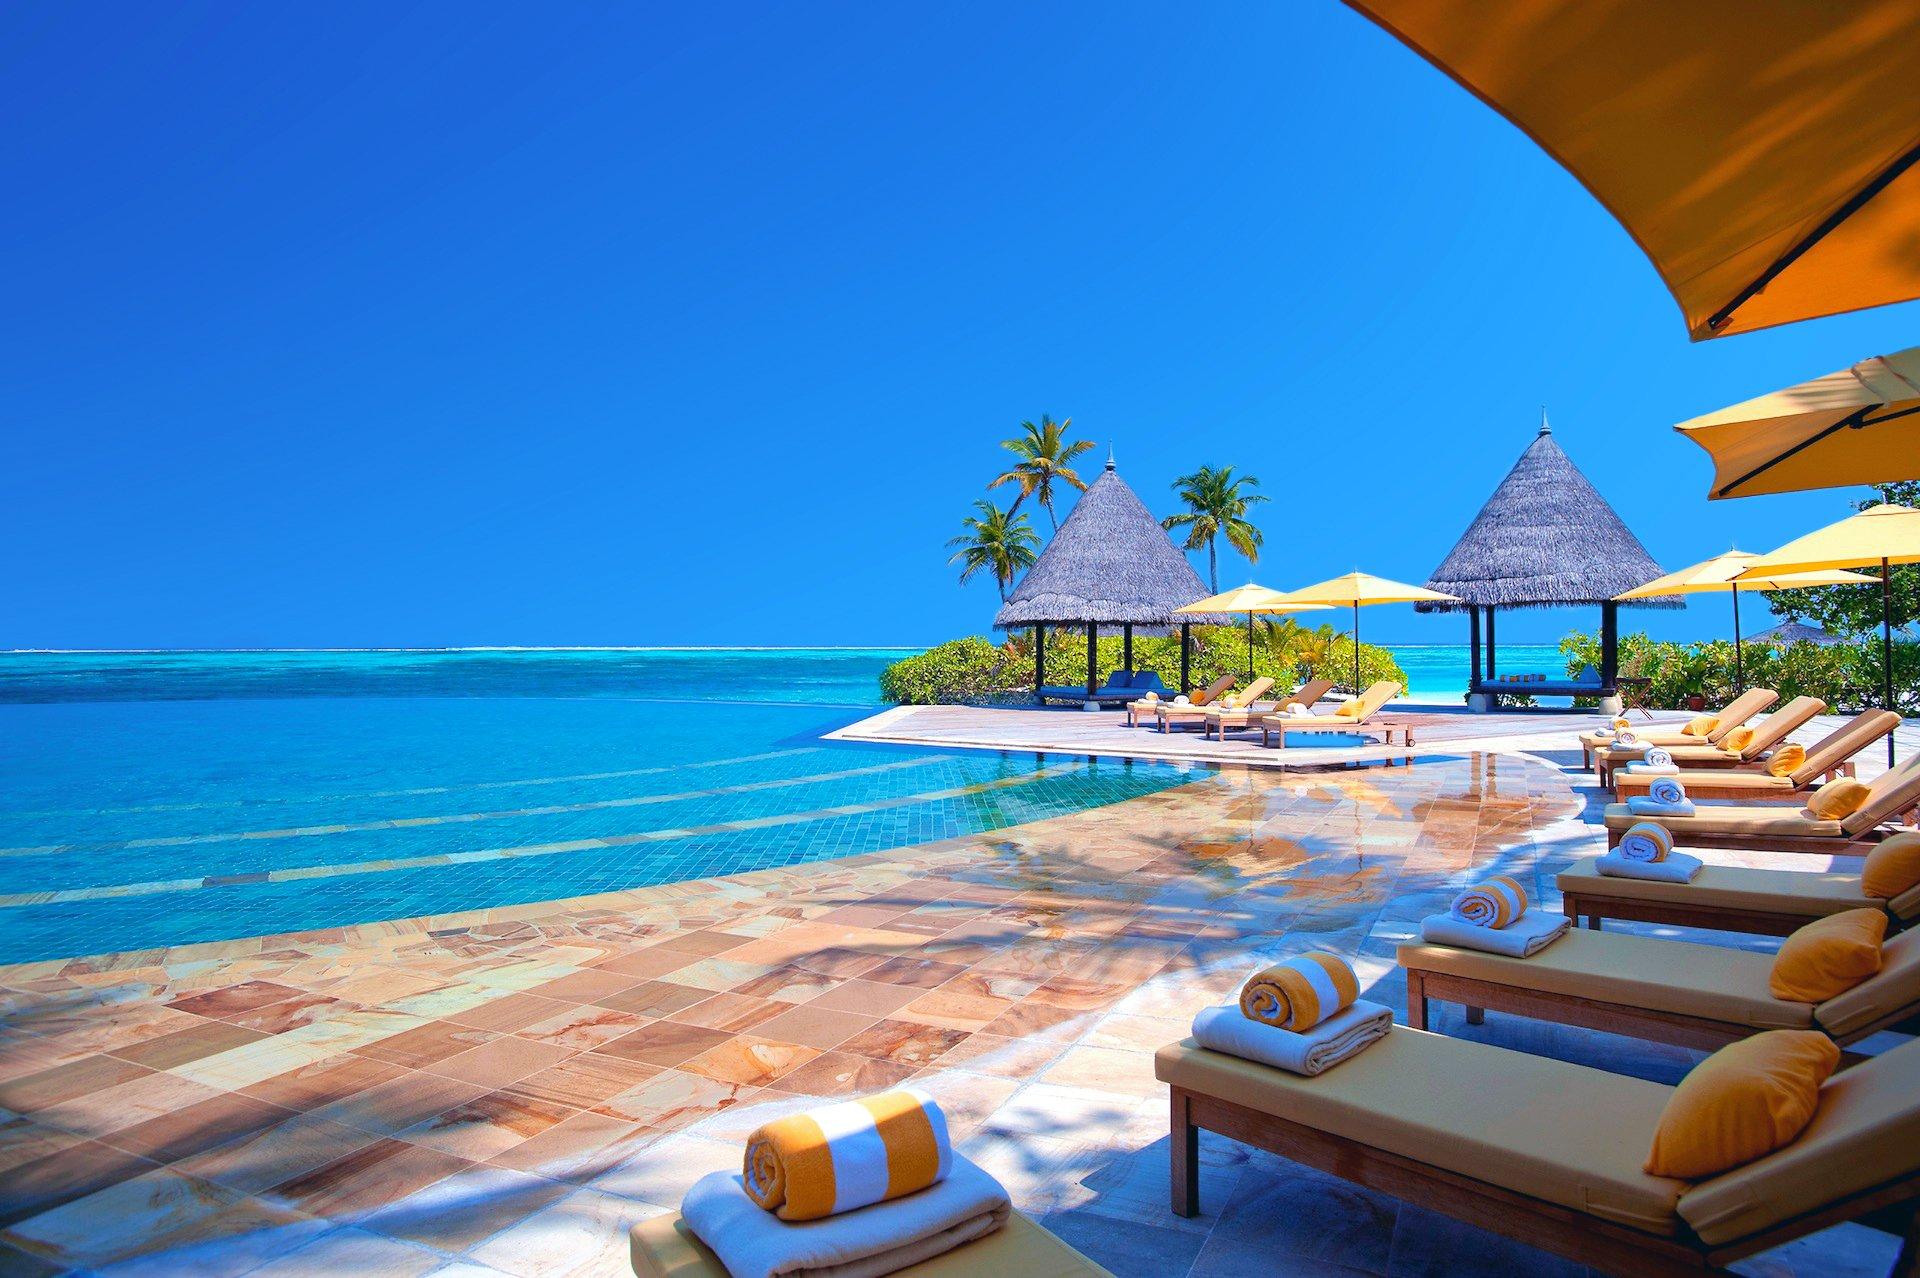 Photography - Holiday  Sky Sea Ocean Umbrella Tree Bungalow Pillow Pool Wallpaper